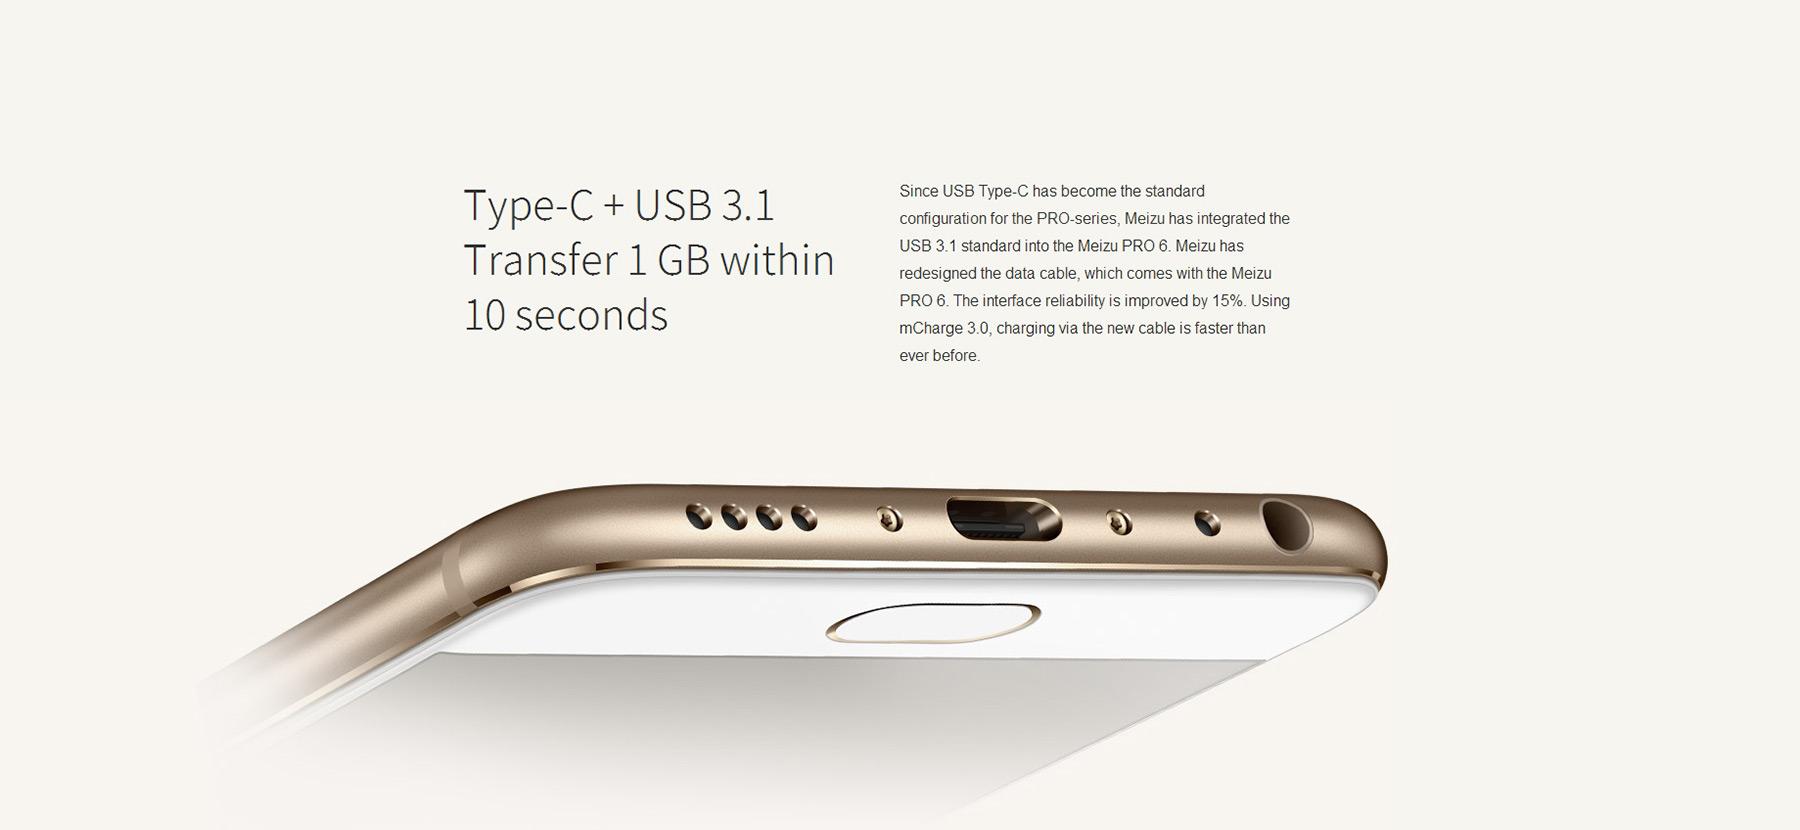 Meizu PRO 6, Antutu, USB-C USB 3.1, China Smartphone, Neuheit, bester Preis, Gearbest, zoll PayPal, LTE 800